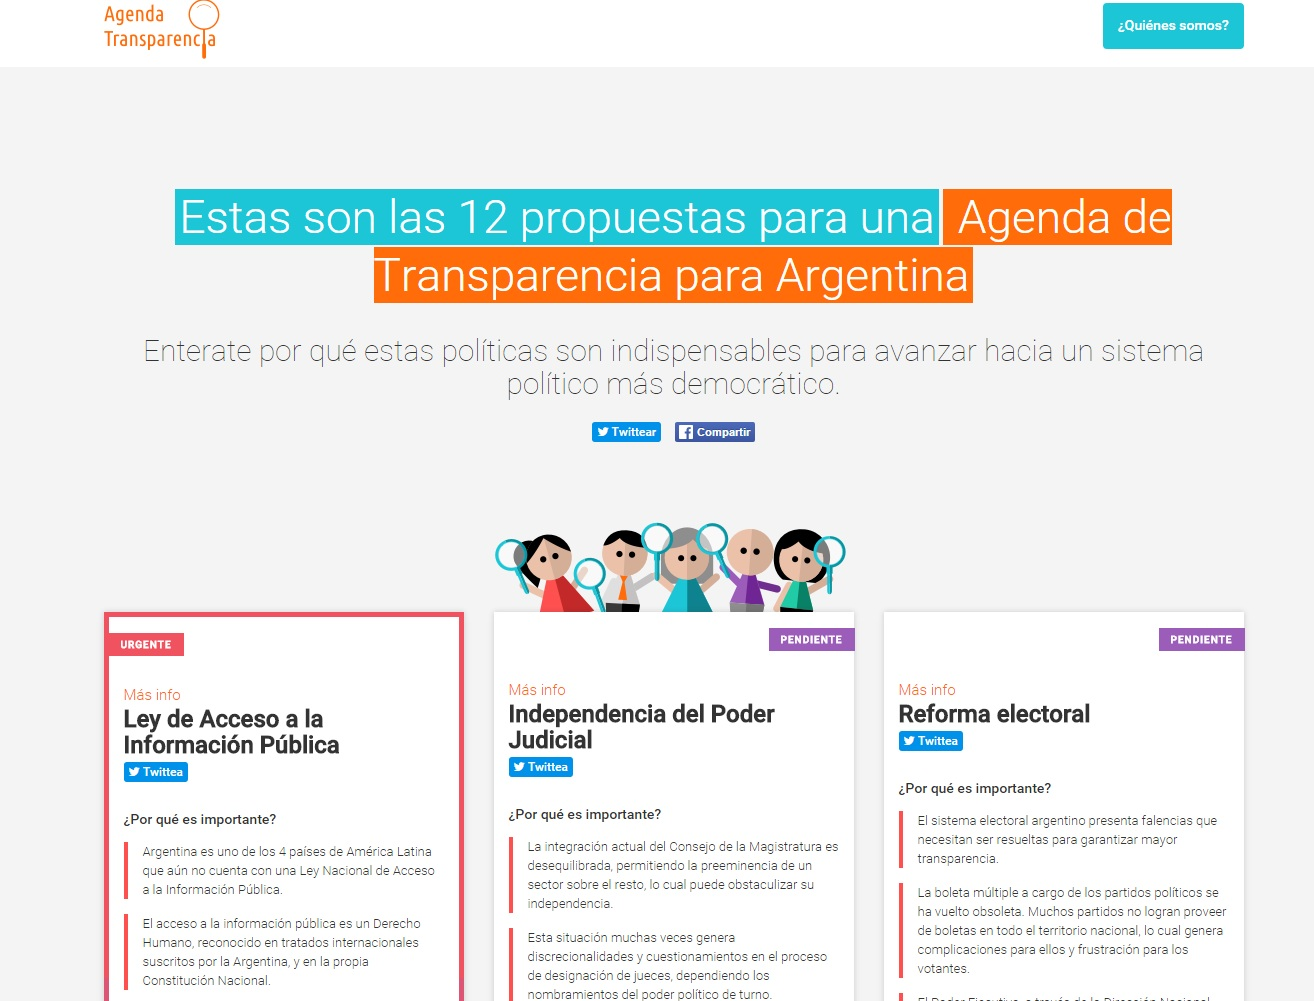 Agenda-de-Transparencia-lanaciondata